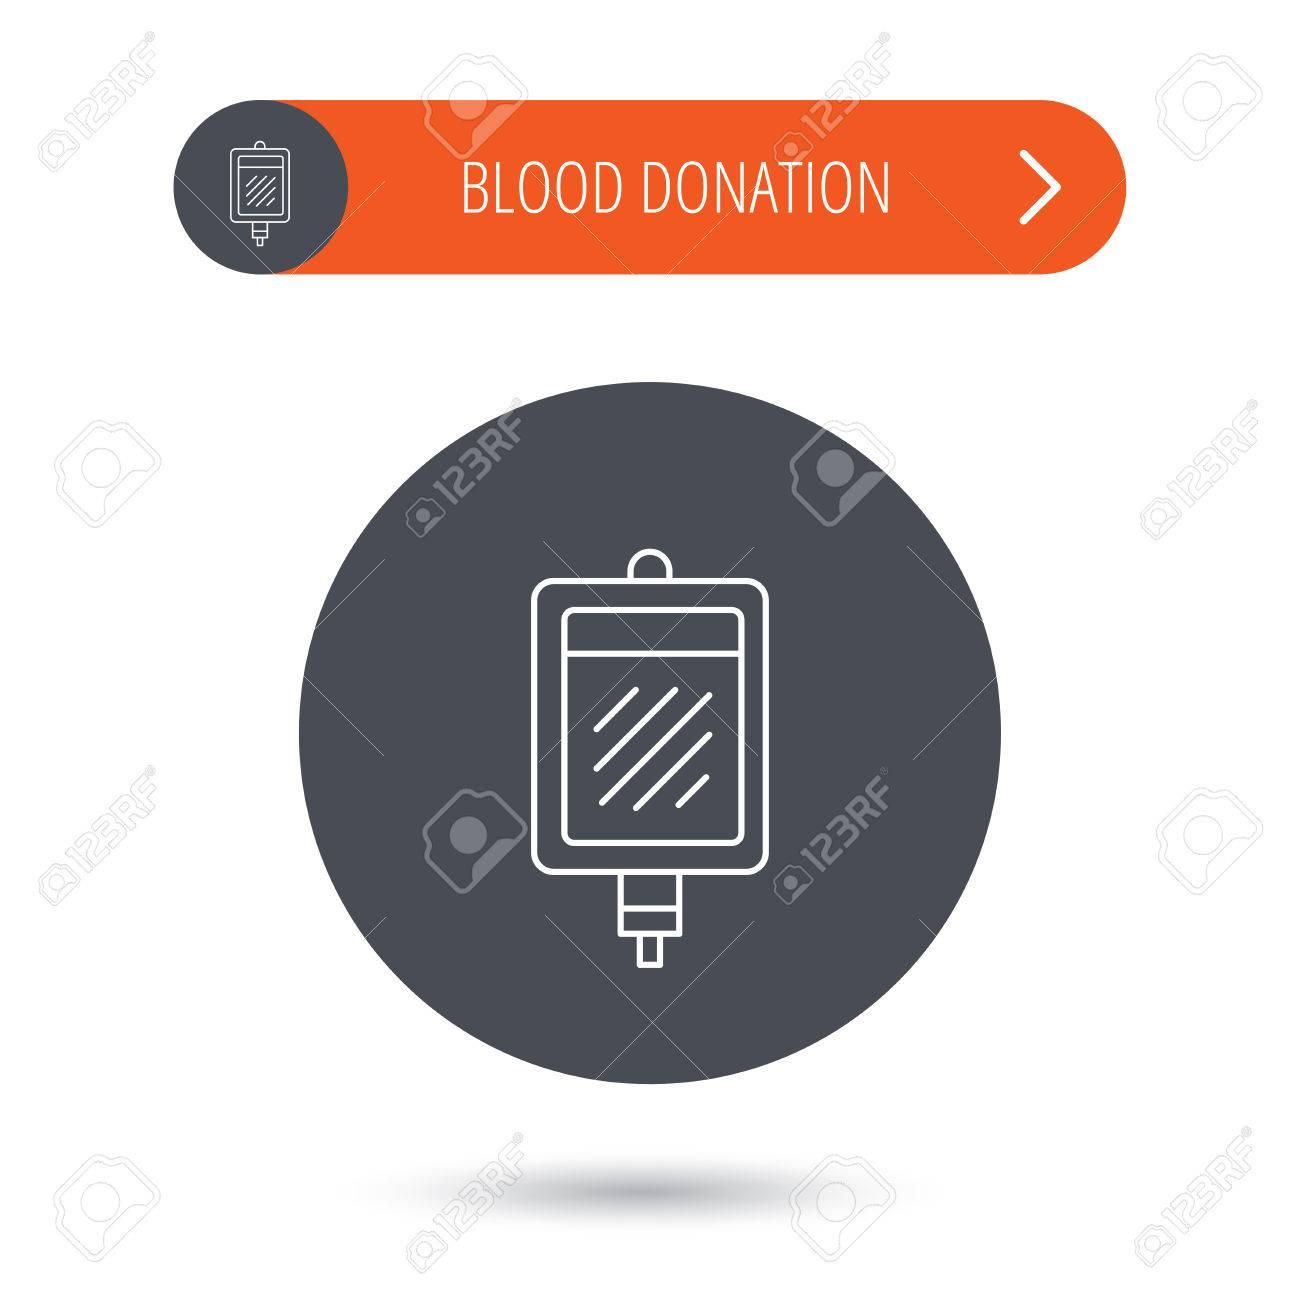 blood donation icon medicine drop counter sign gray flat circle